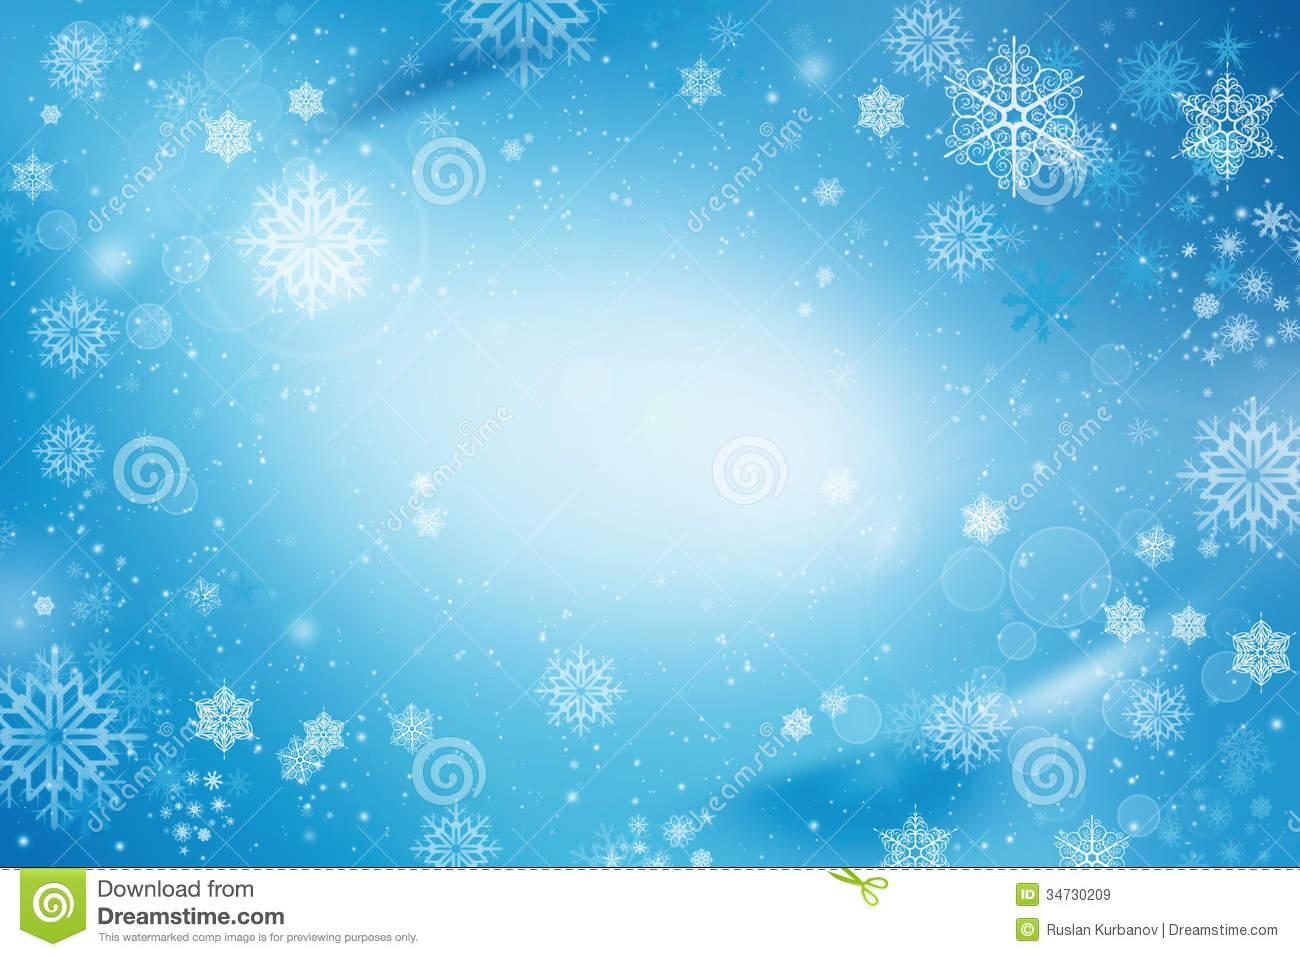 winter party images stock photos vectors shutterstock